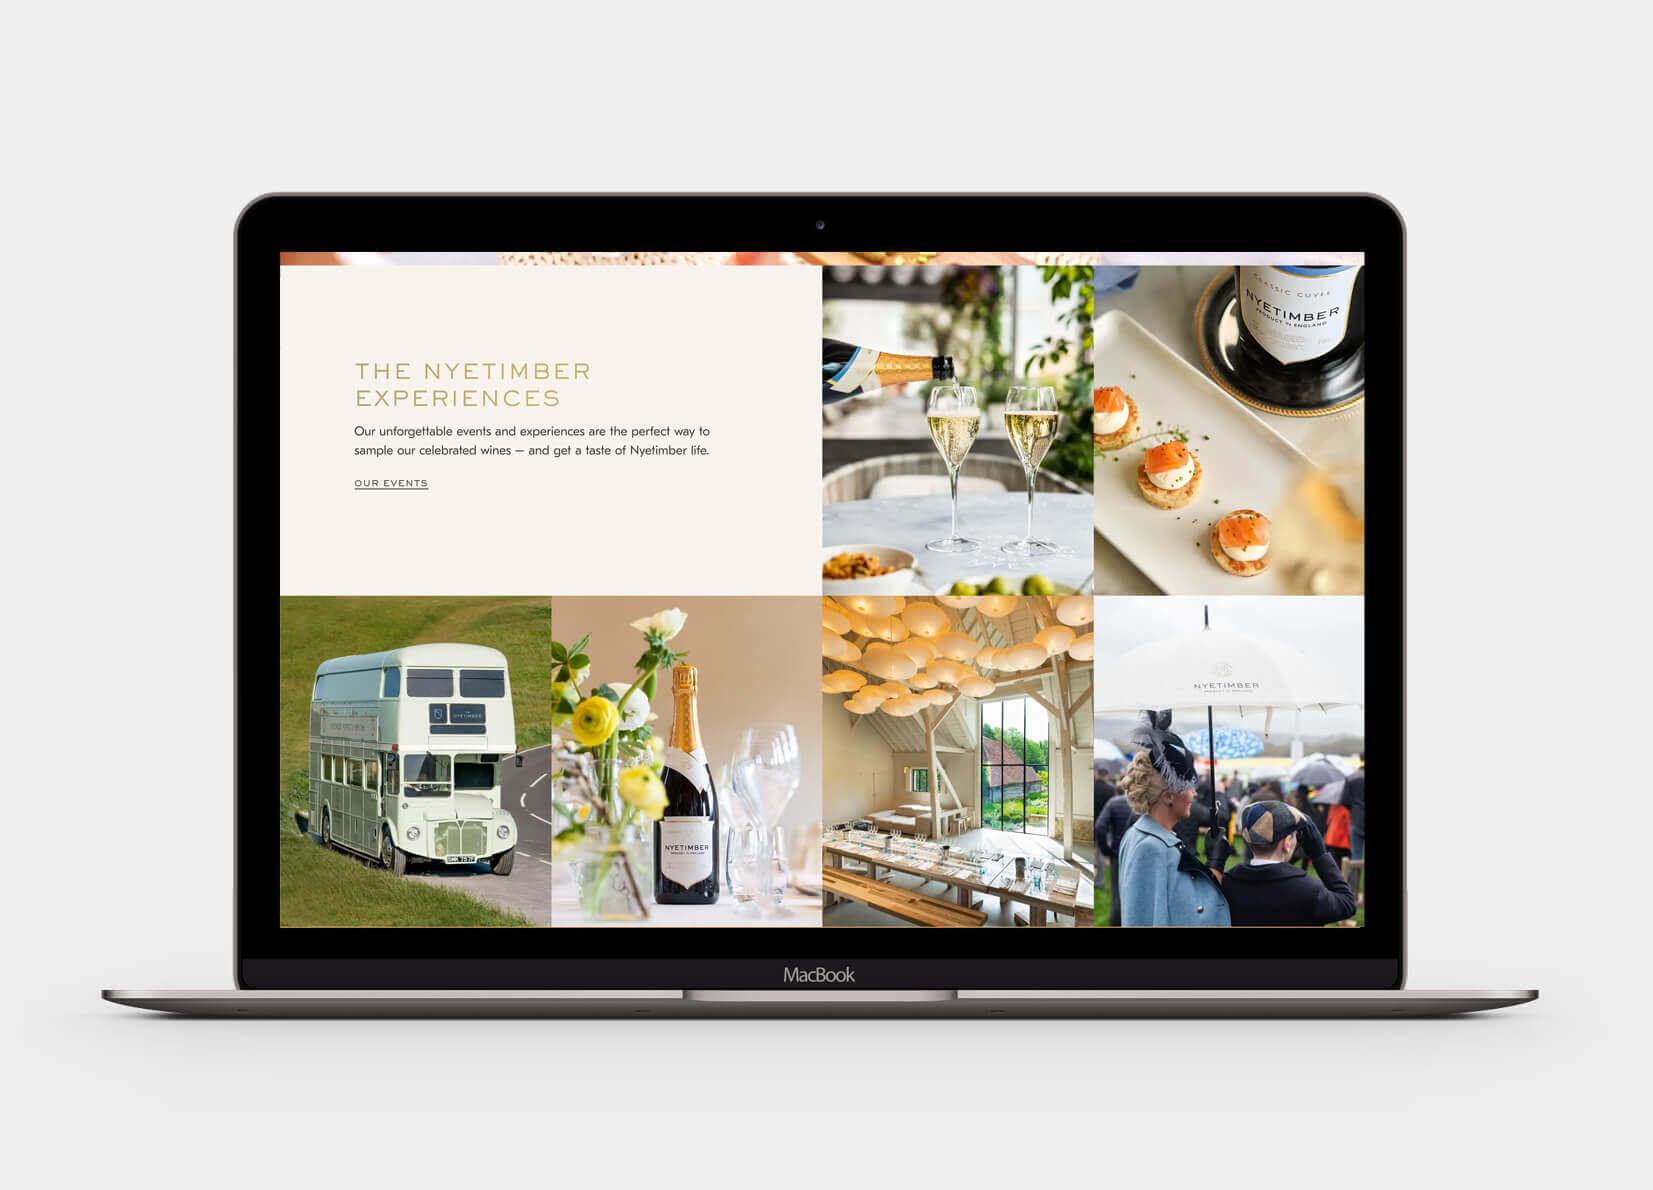 Chanelle-Sharp-Digital-Designer-Nyetimber-MacBook3